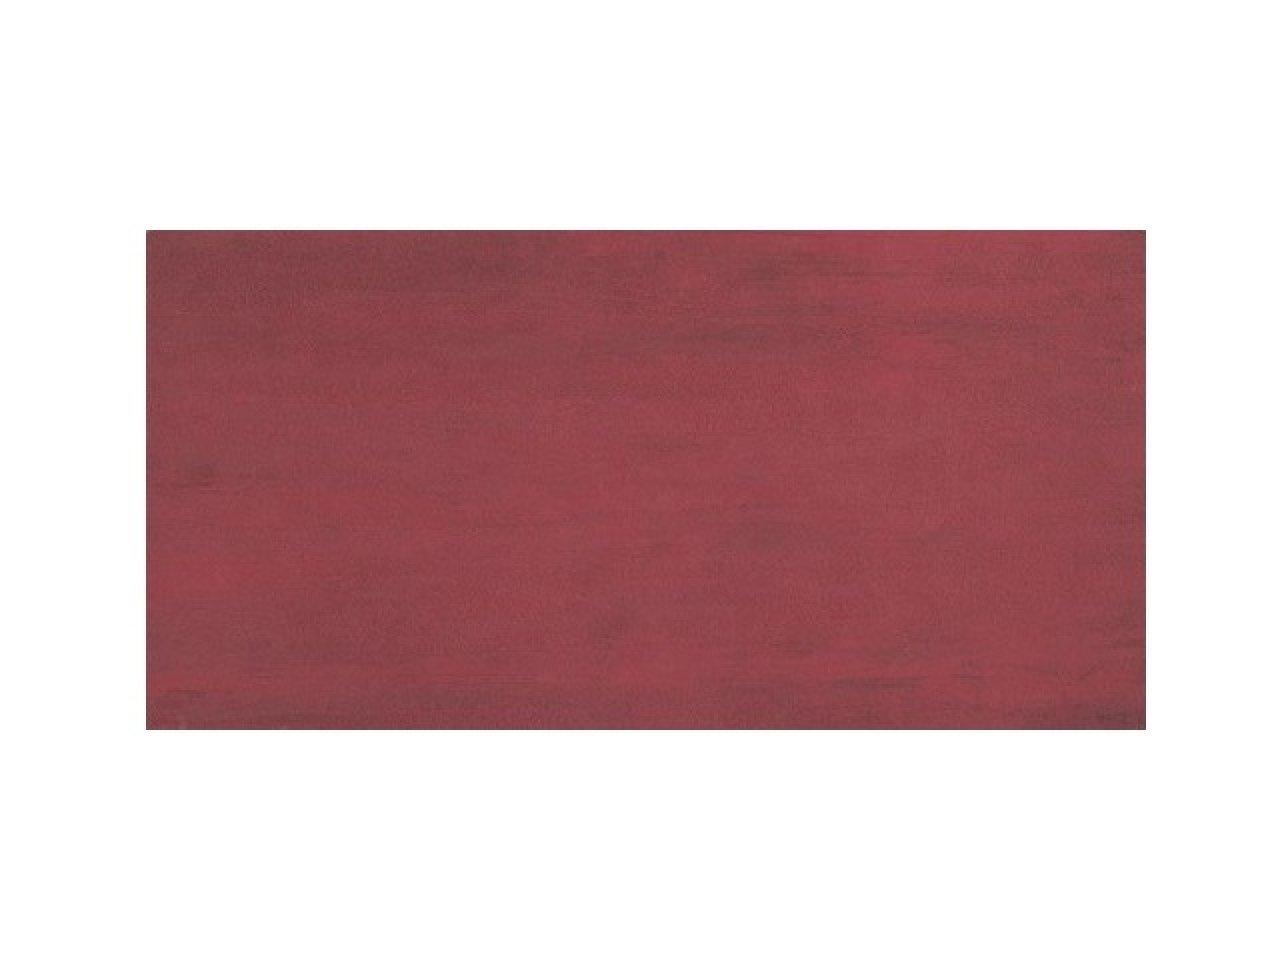 Настенная плитка Arty Tabasco 40x80